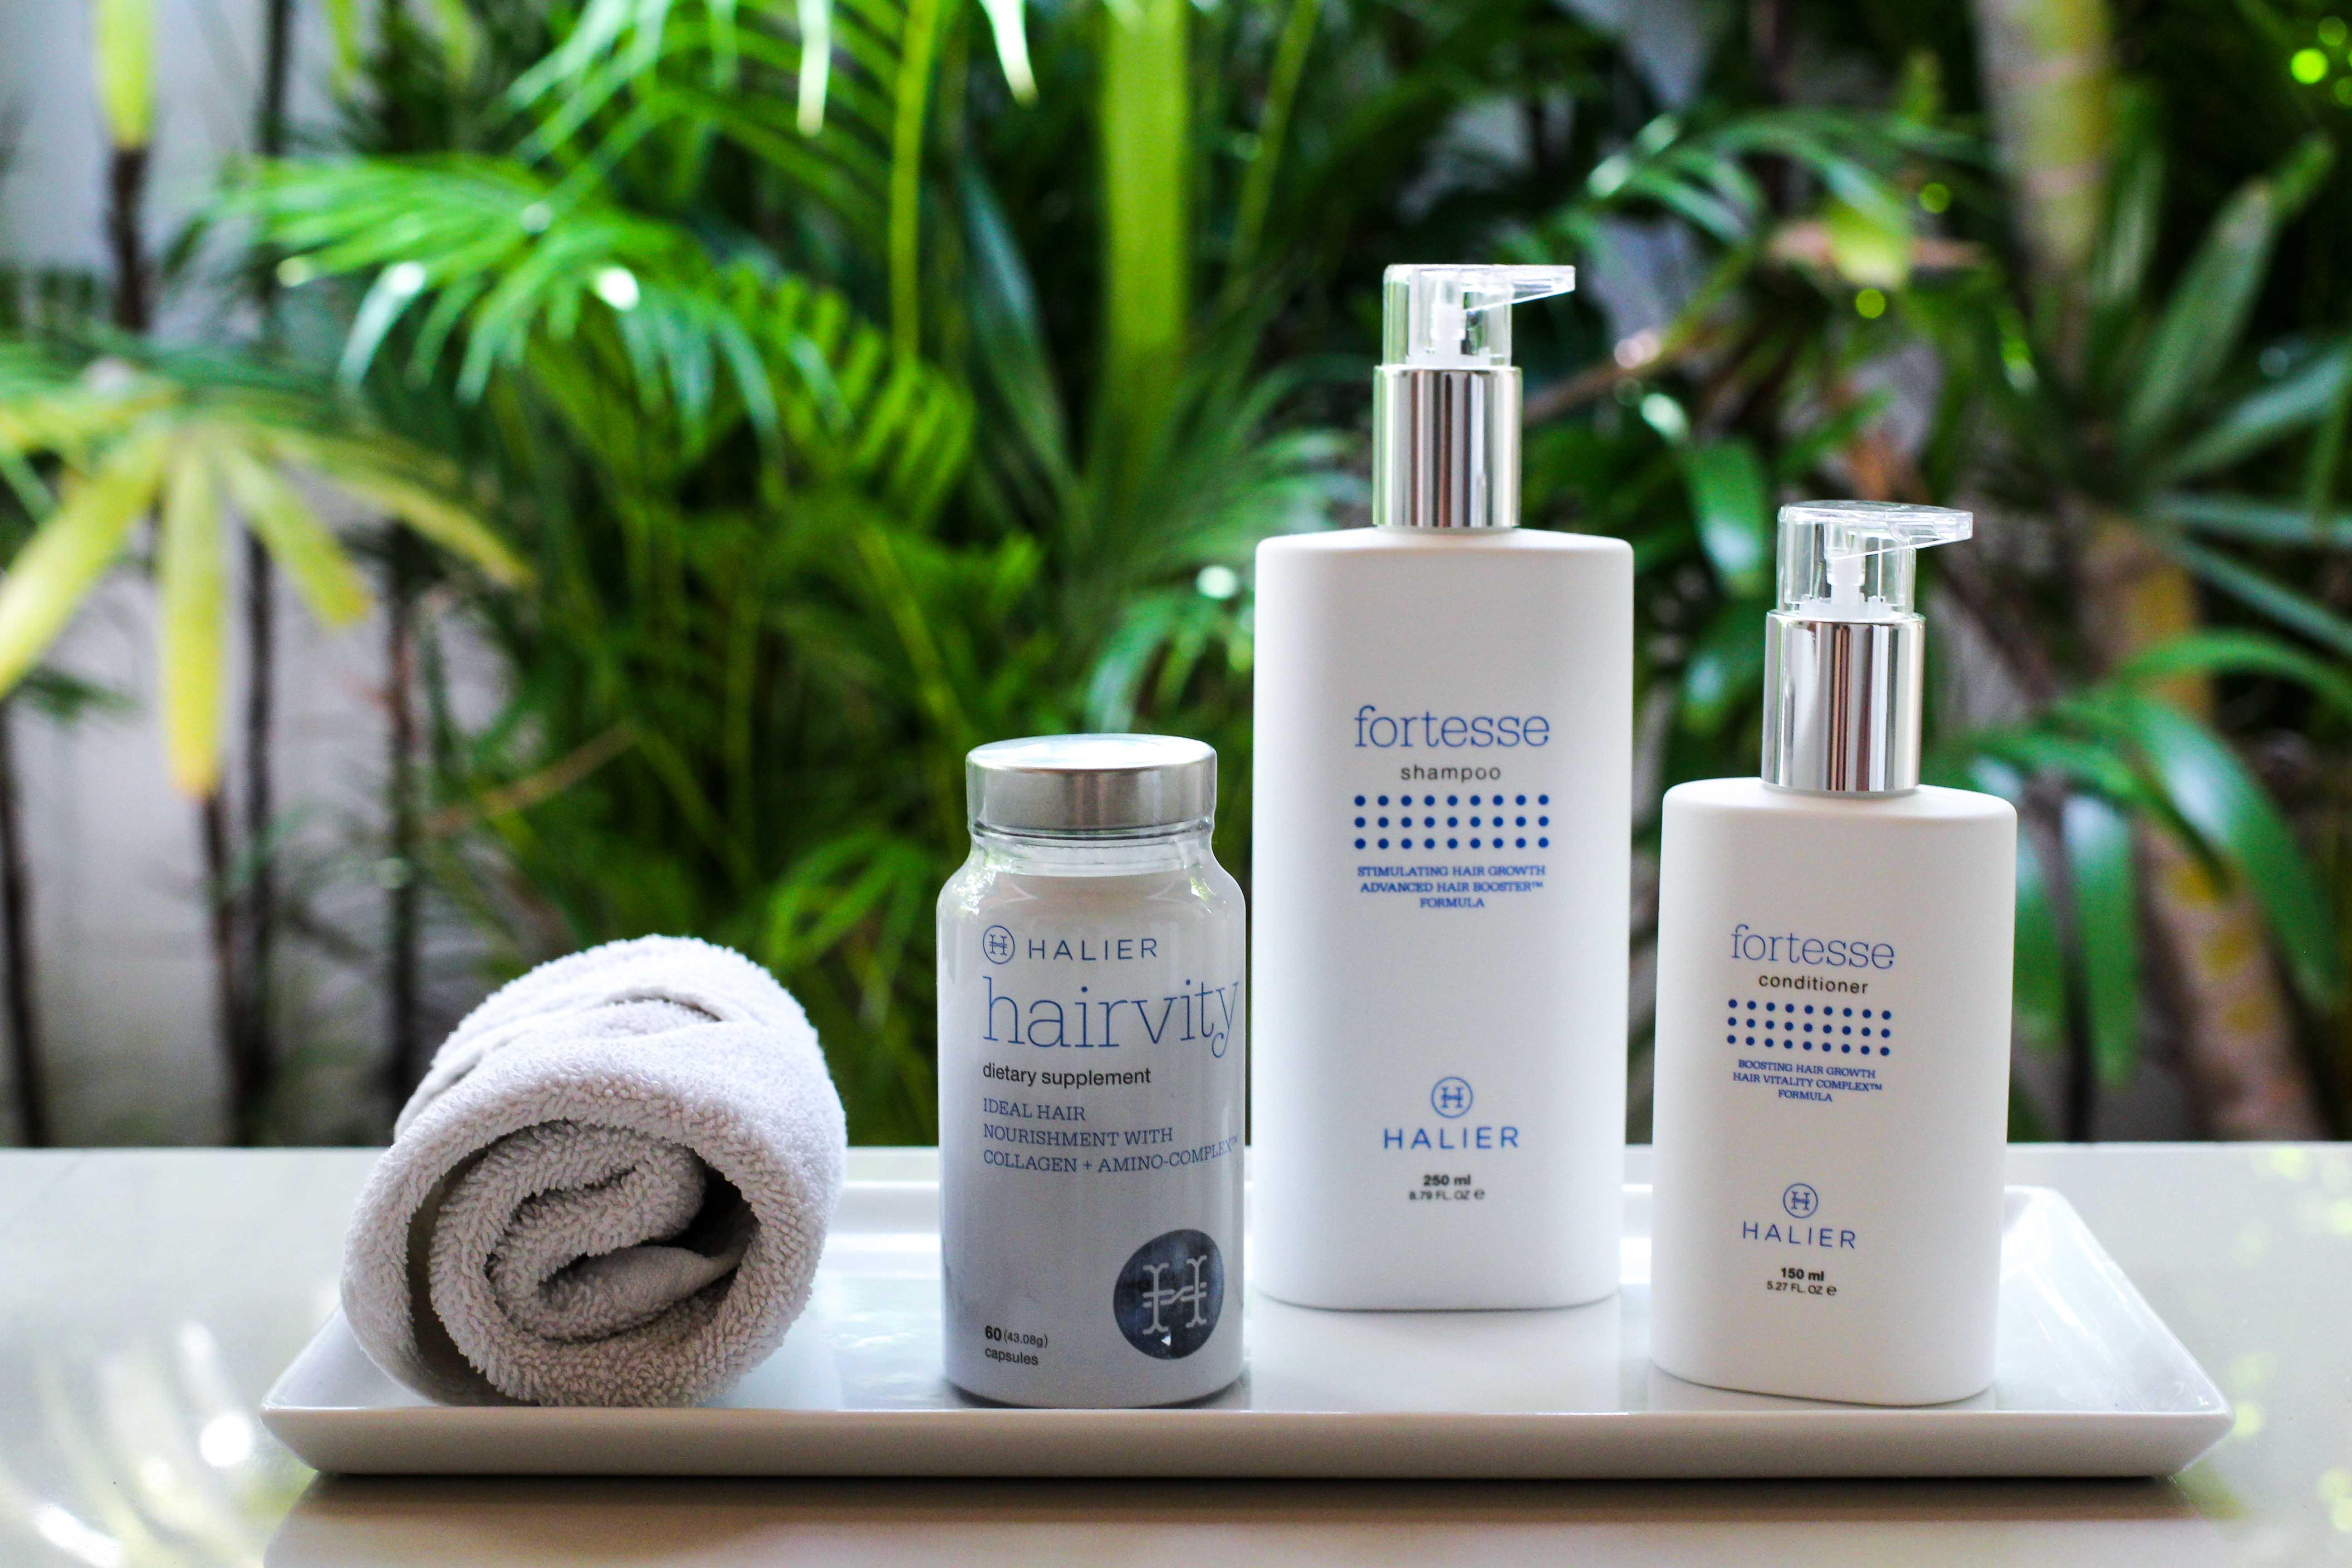 Haarpflege Halier Fortesse Shampoo Conditioner Test gesundes kräftiges Haar Beauty Blog Bali